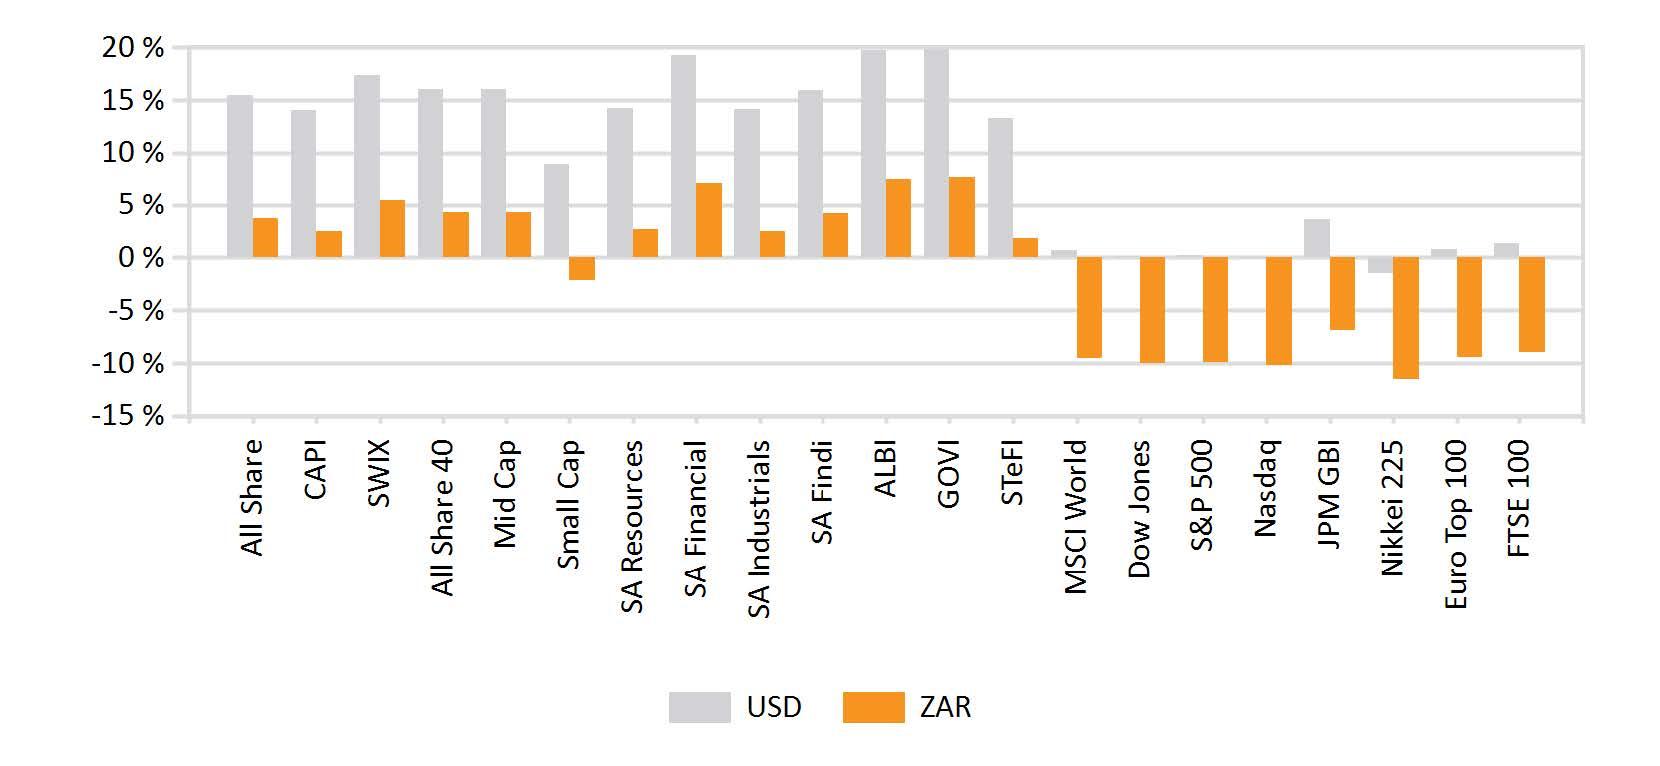 Quarterly return of major indices